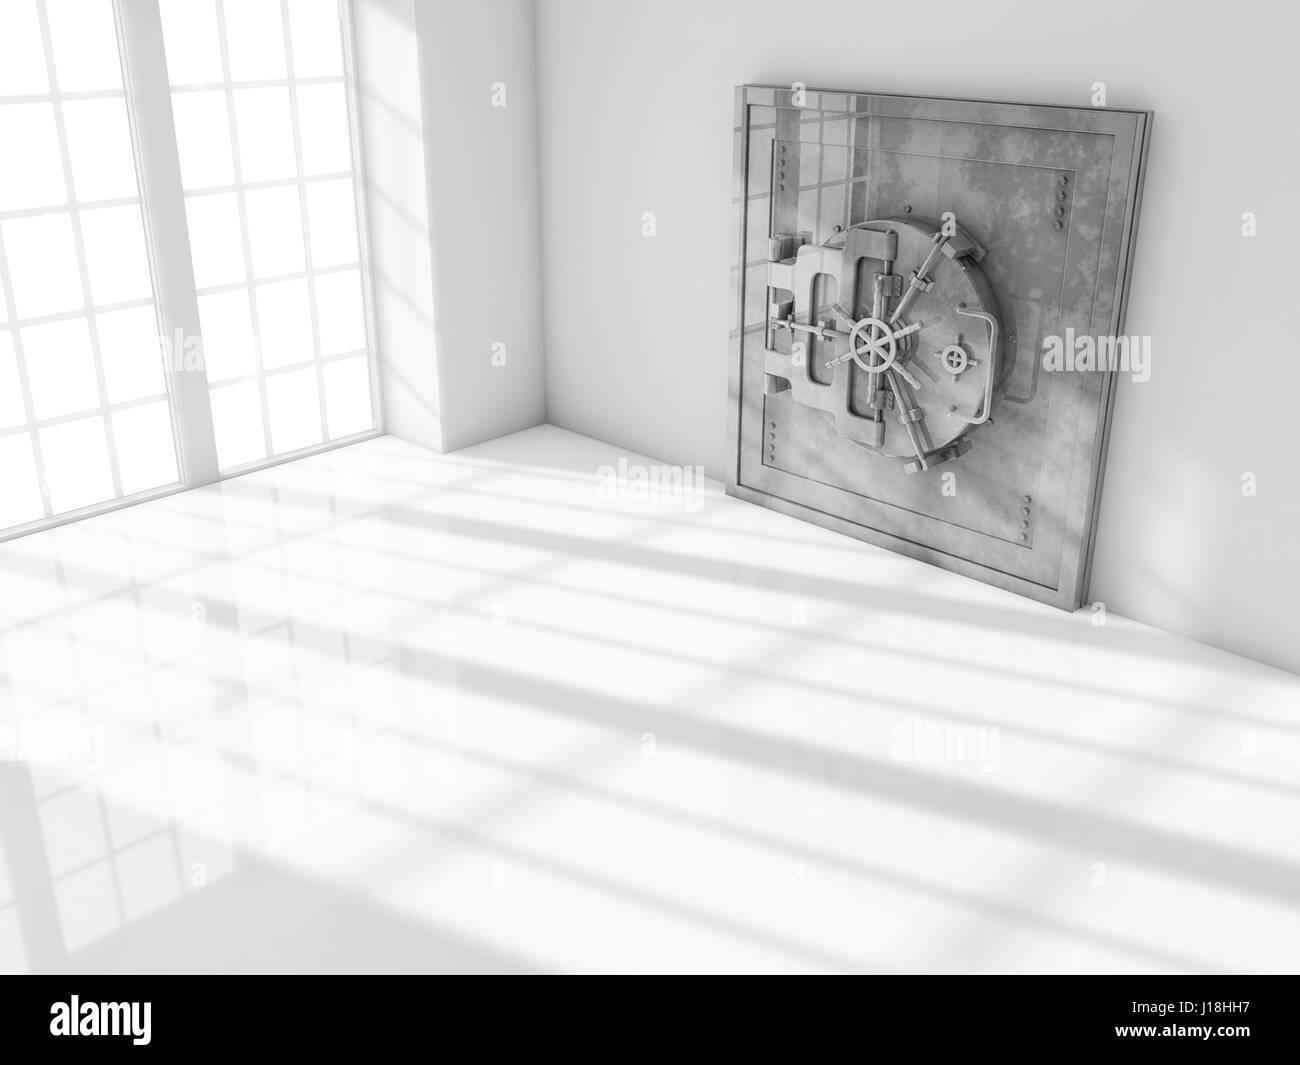 Safe room - Stock Image